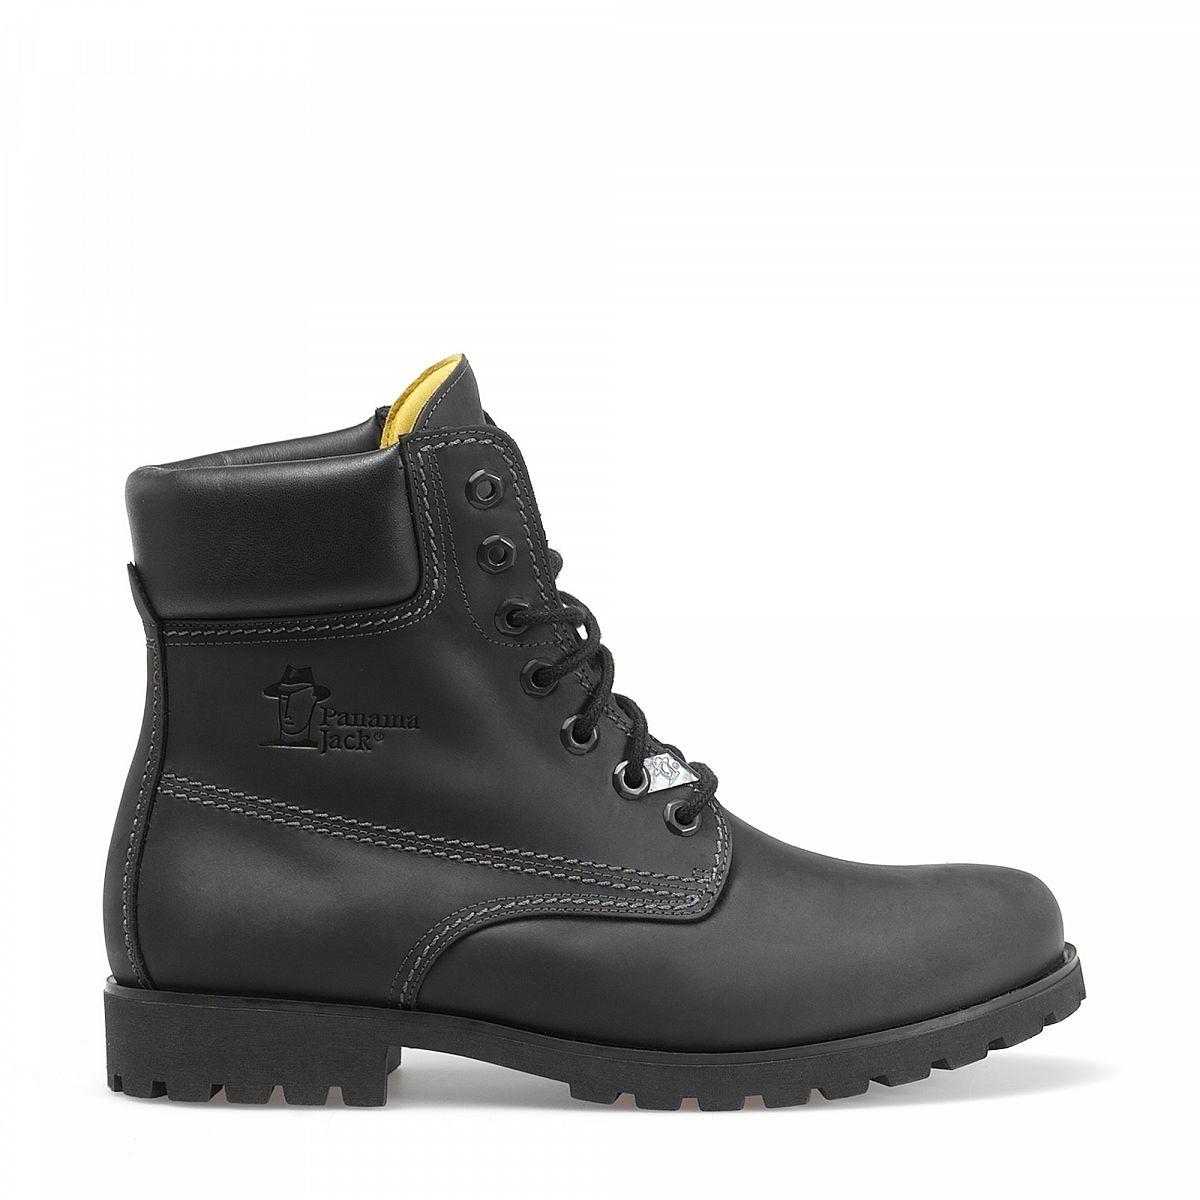 mens boots panama 03 black panama jack official shop. Black Bedroom Furniture Sets. Home Design Ideas